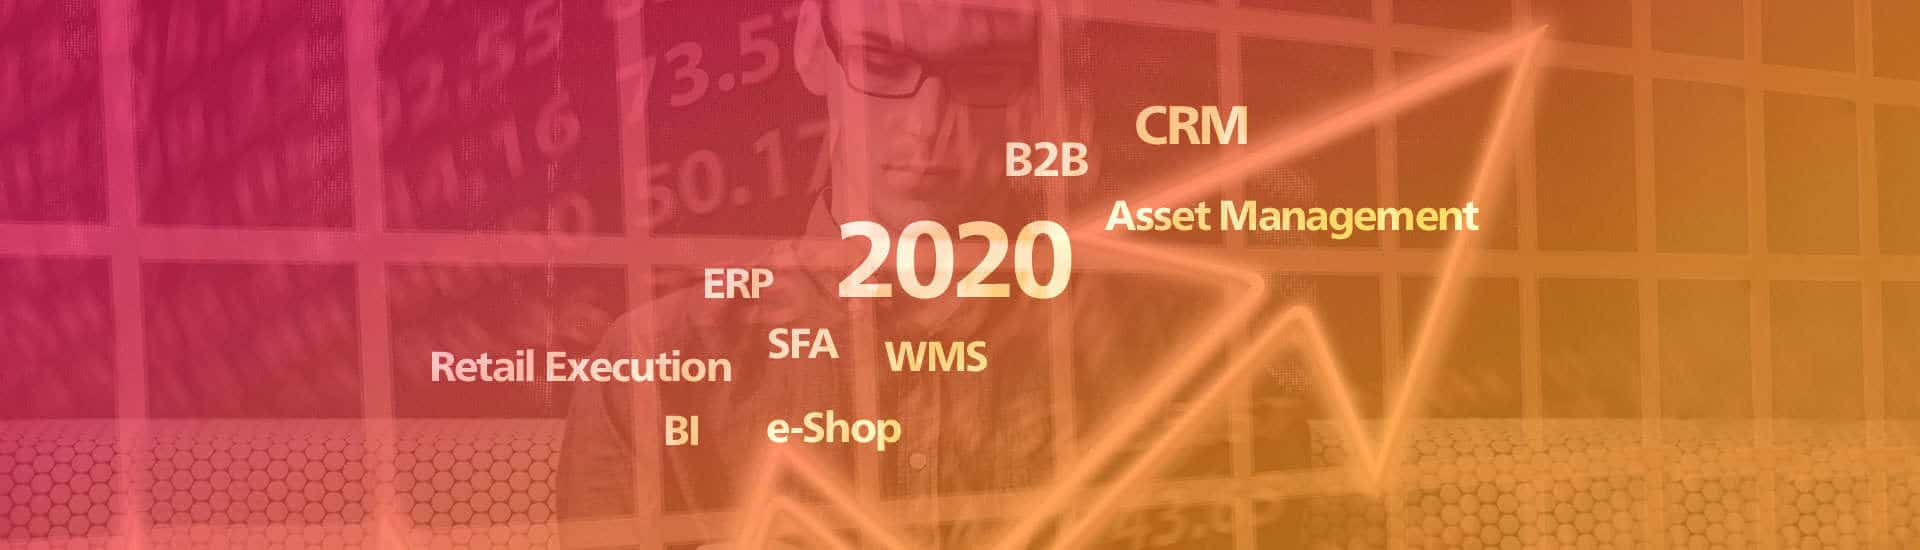 Transart rezultate 2020